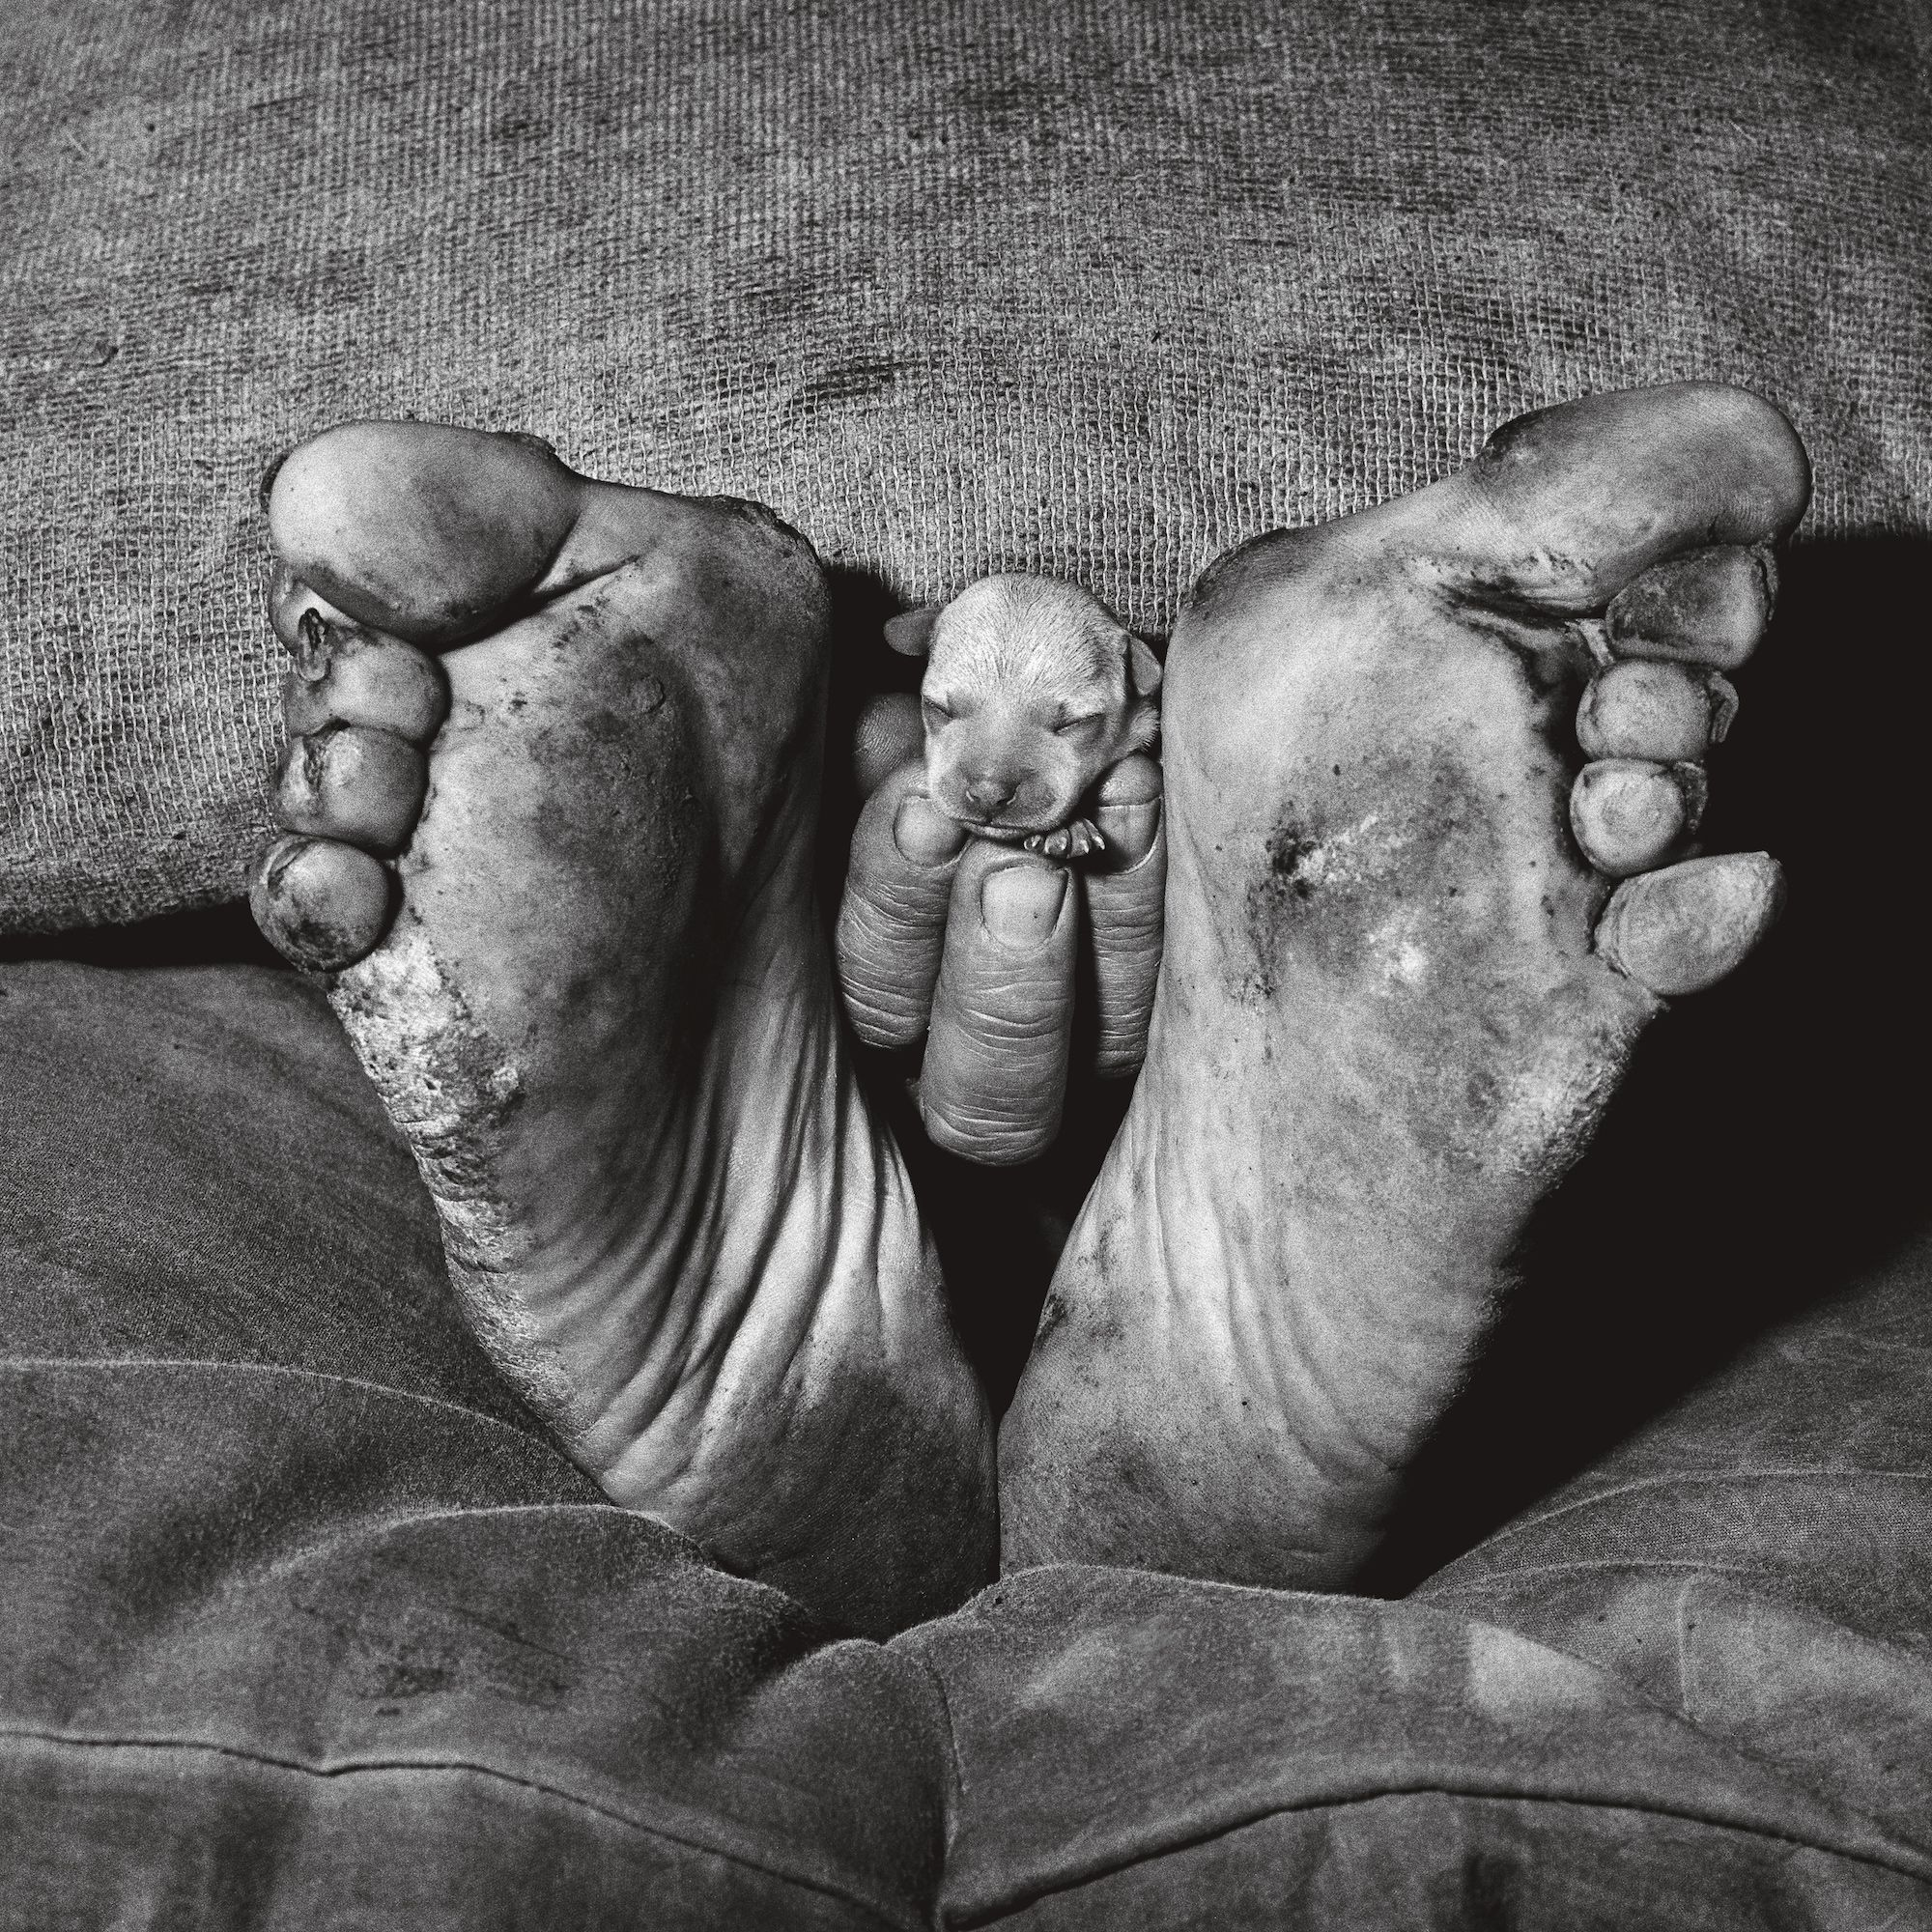 Jessie Pelada unearthed photos from roger ballen's nightmarish archive